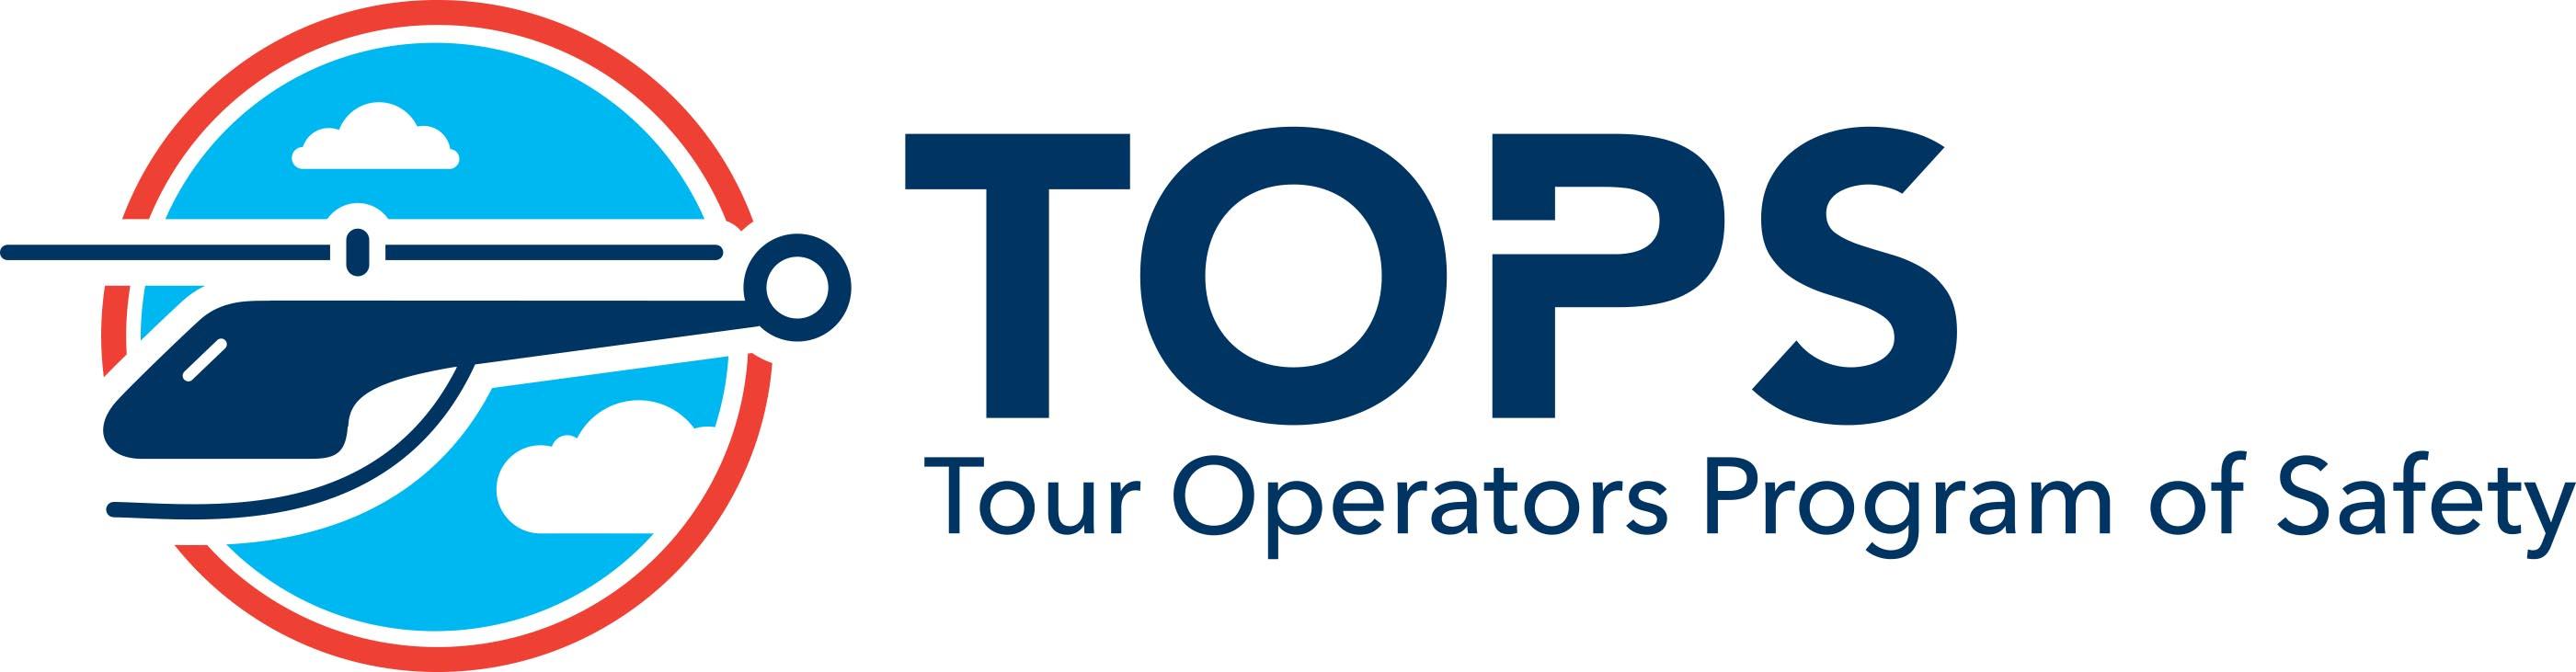 tops-logo.jpg